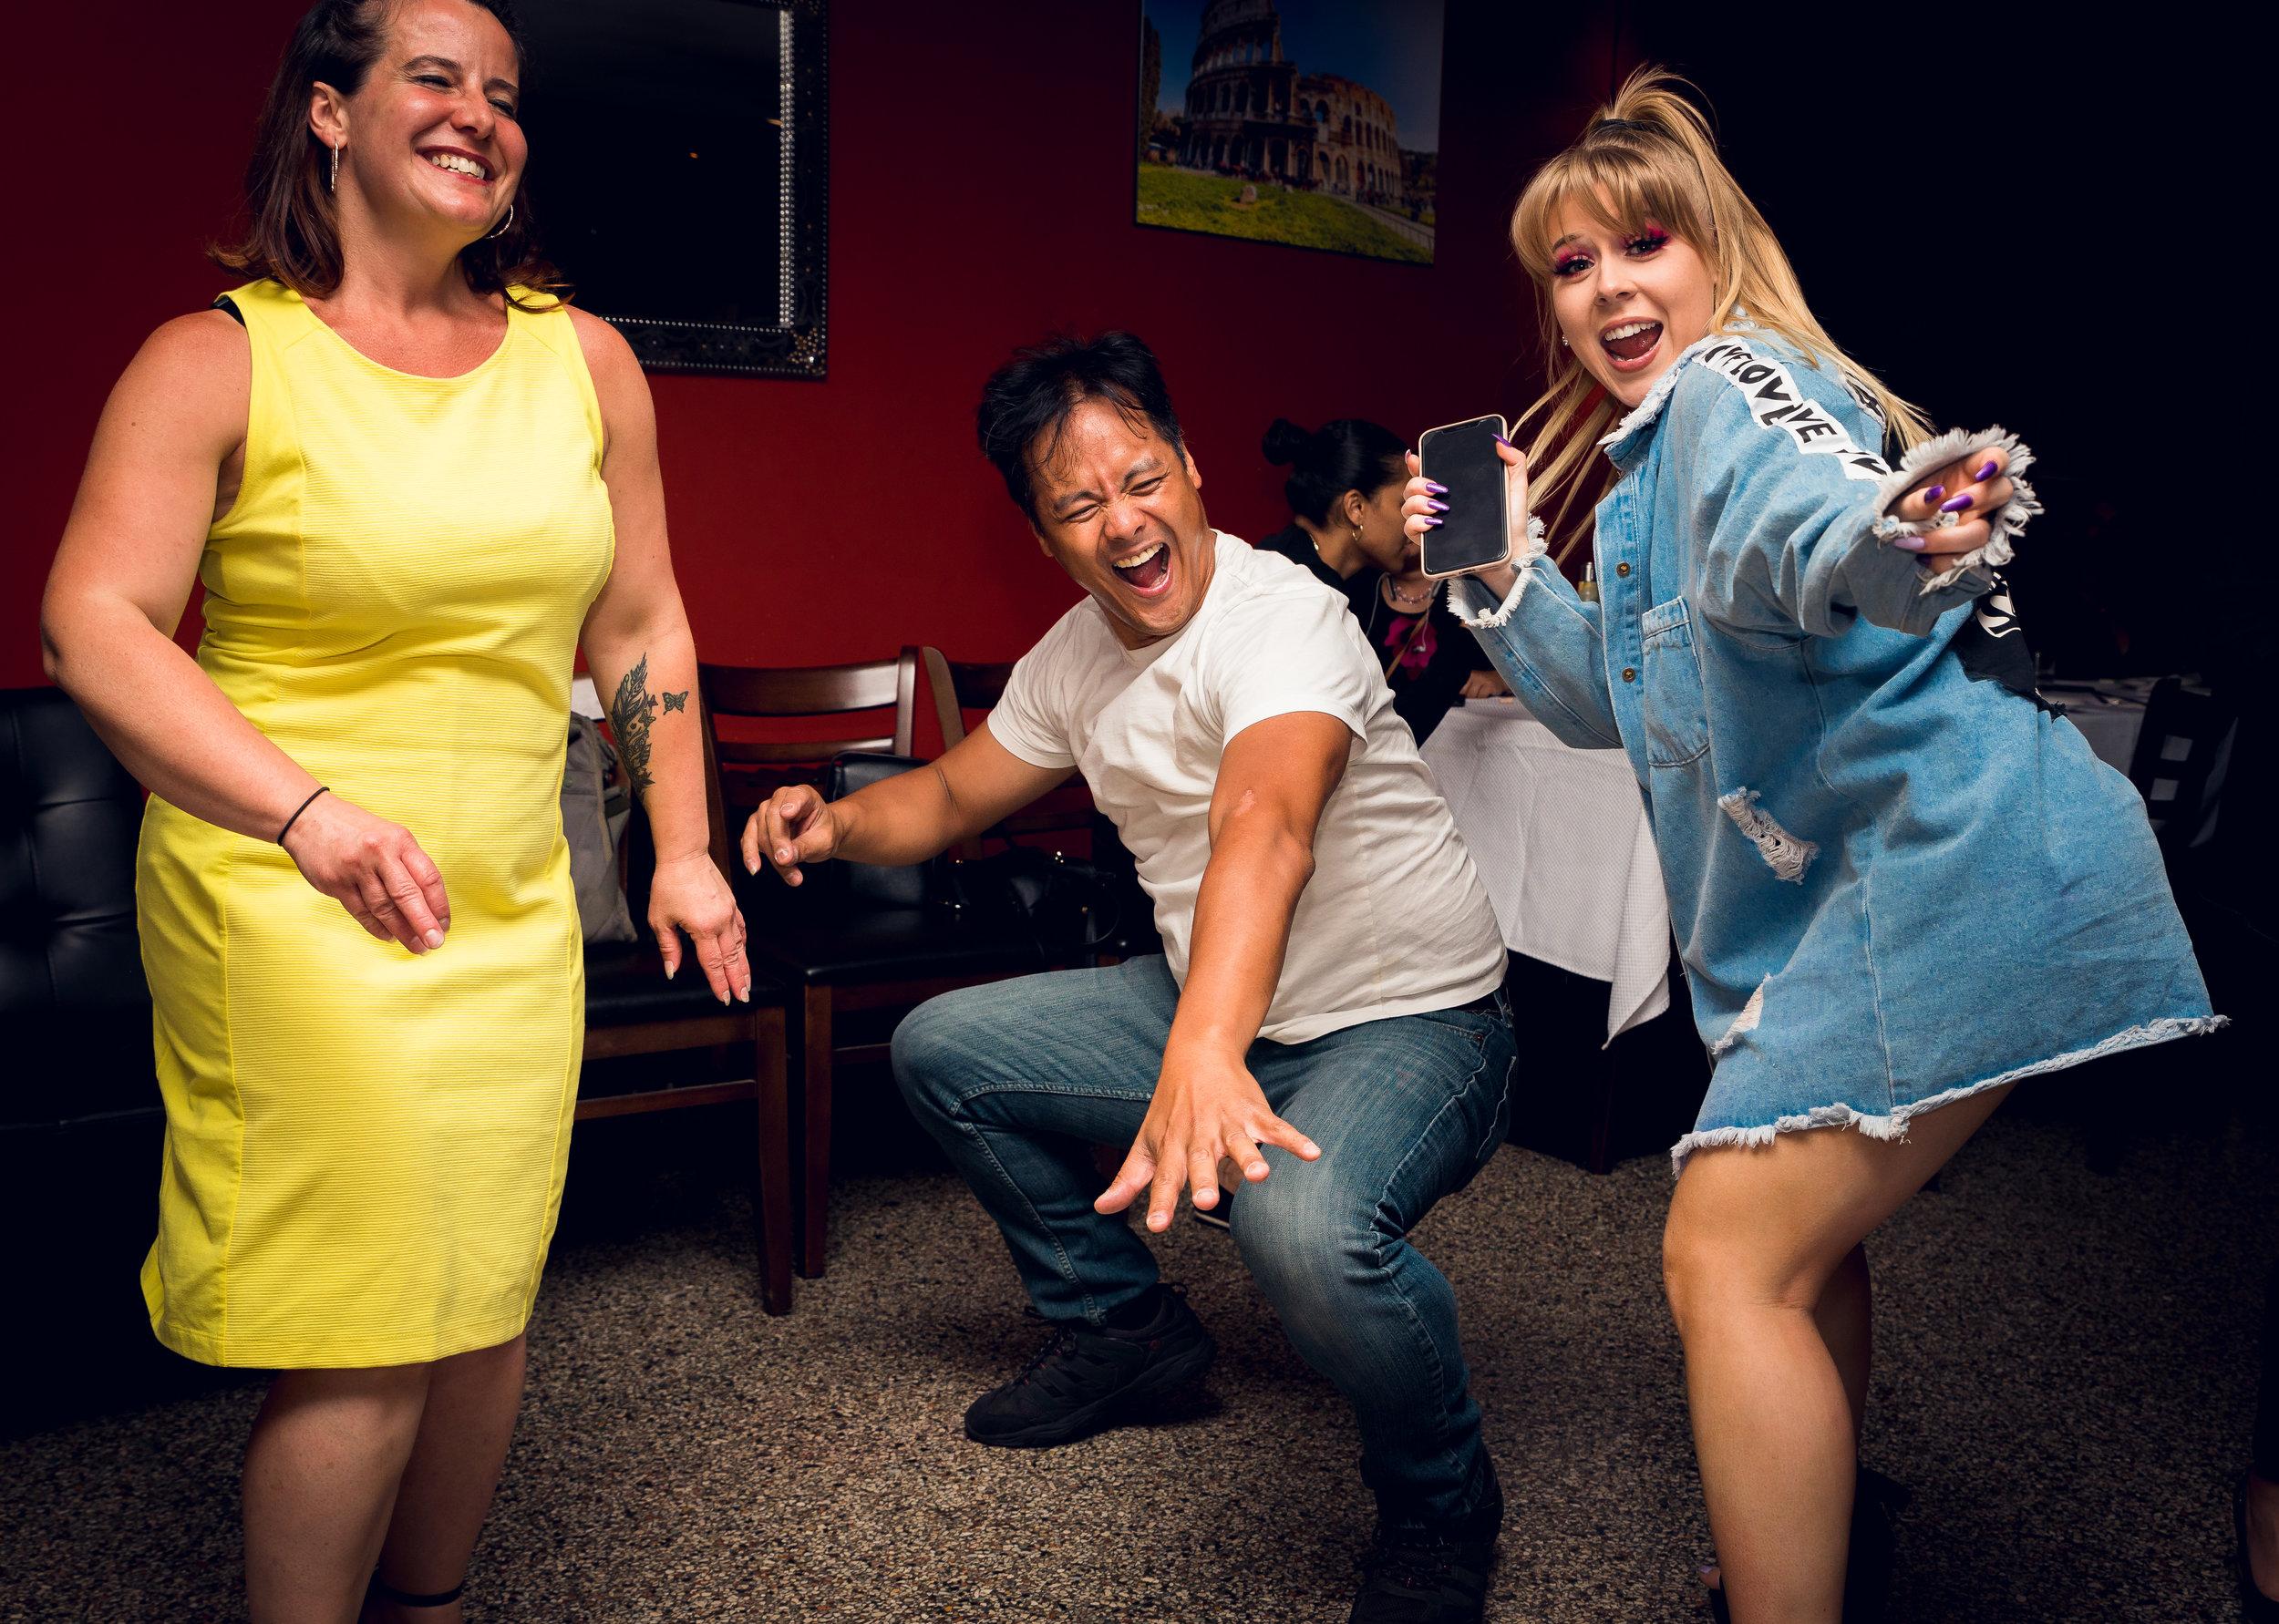 Scottie G of The Funky Bunch Live @ Salto Restaurant - Proofs-79.jpg